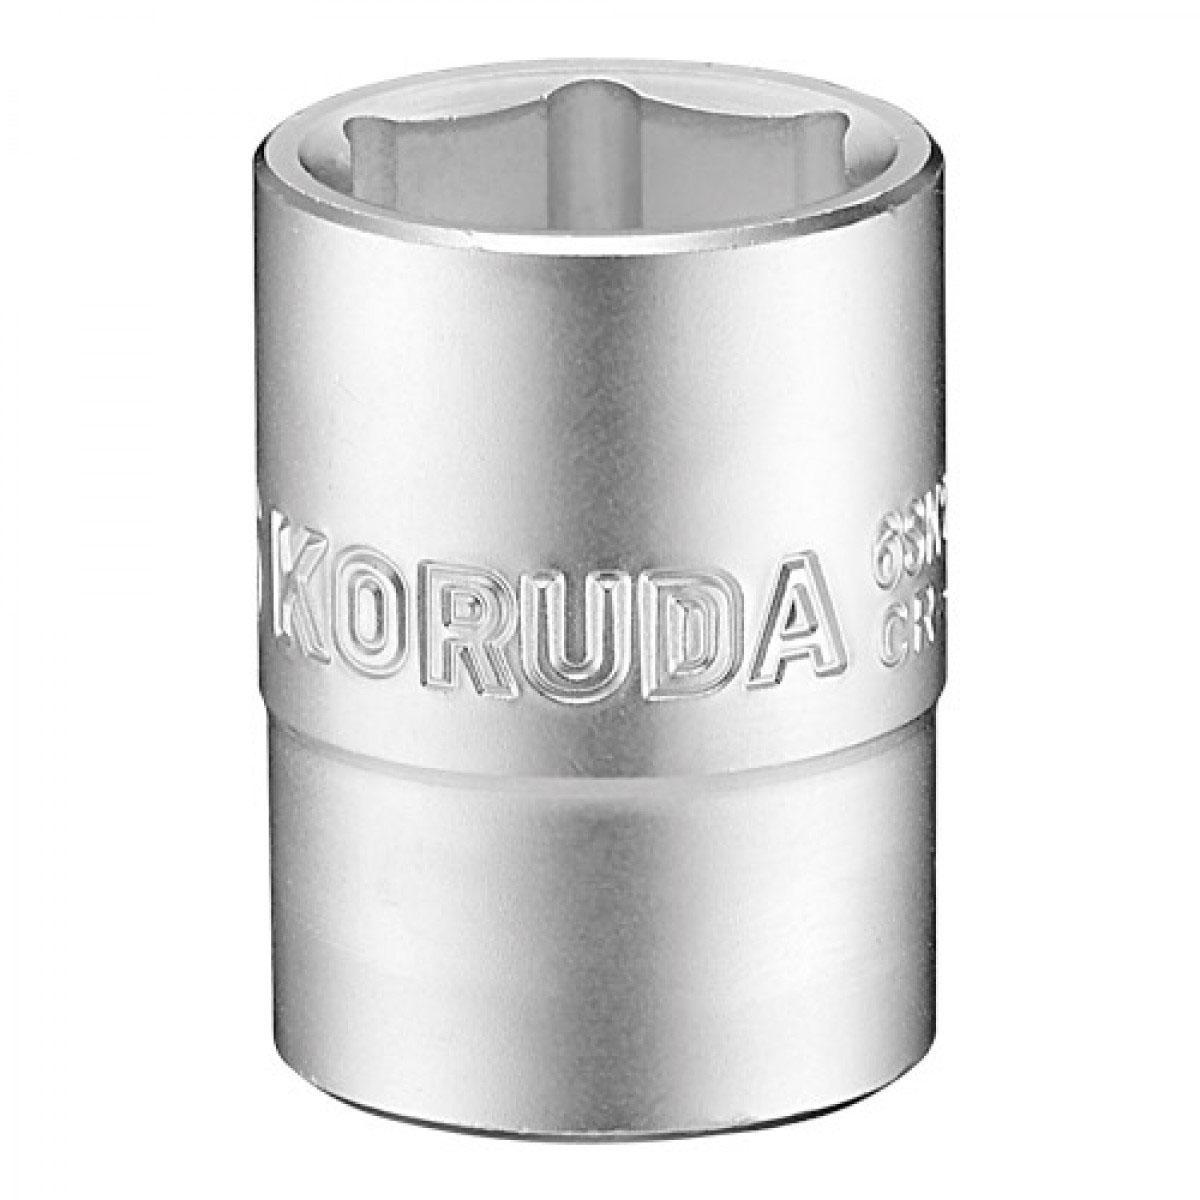 цены Головка Koruda размер 26мм, s 3/4'' (6sk26)